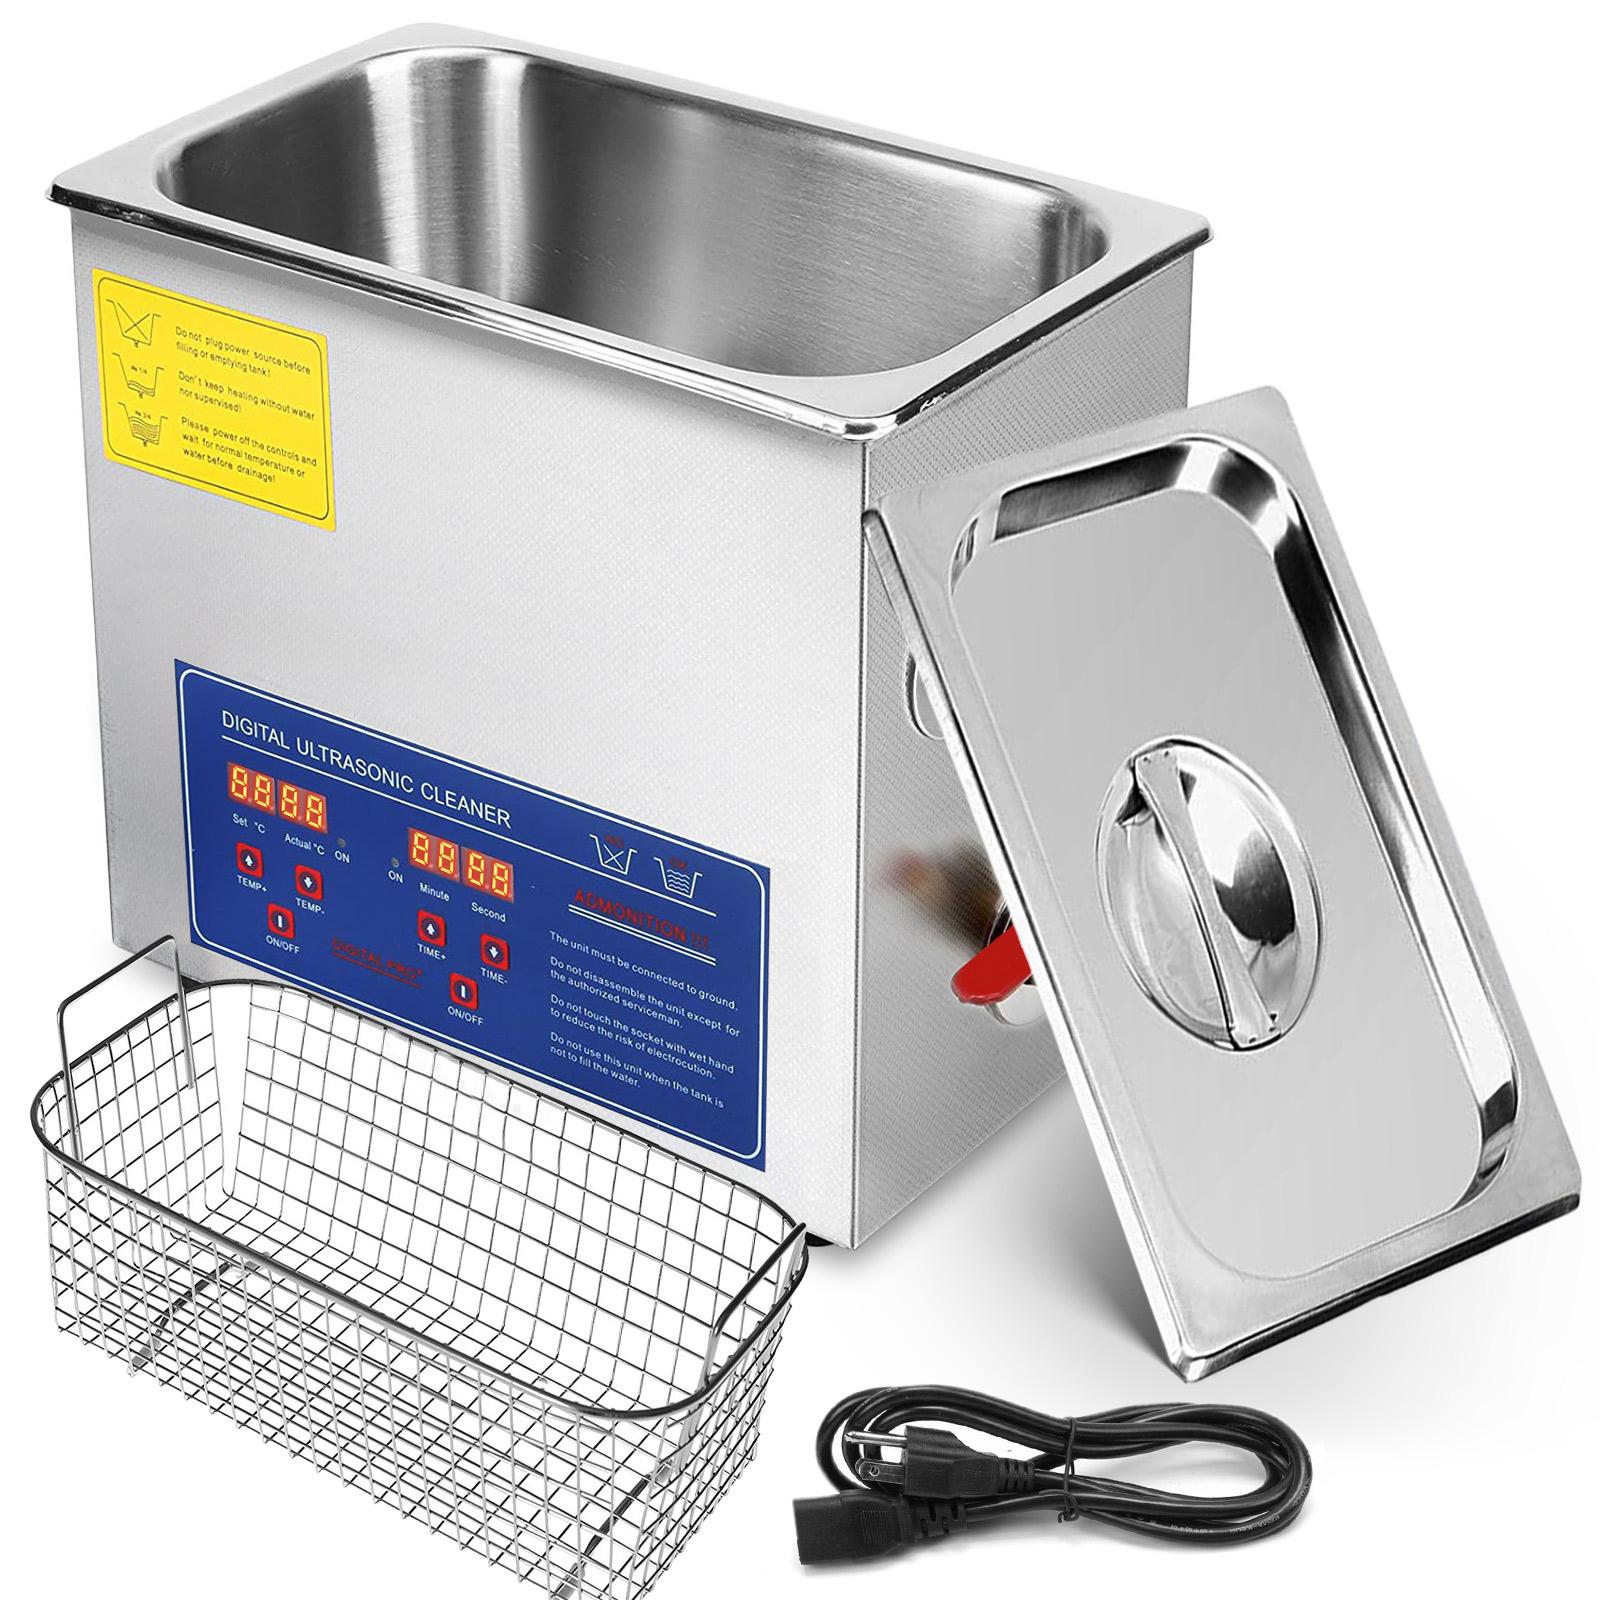 Vaschetta-Vasca-Ultrasuoni-Lavatrice-Pulitore-Ad-Ultrasuoni miniatura 60